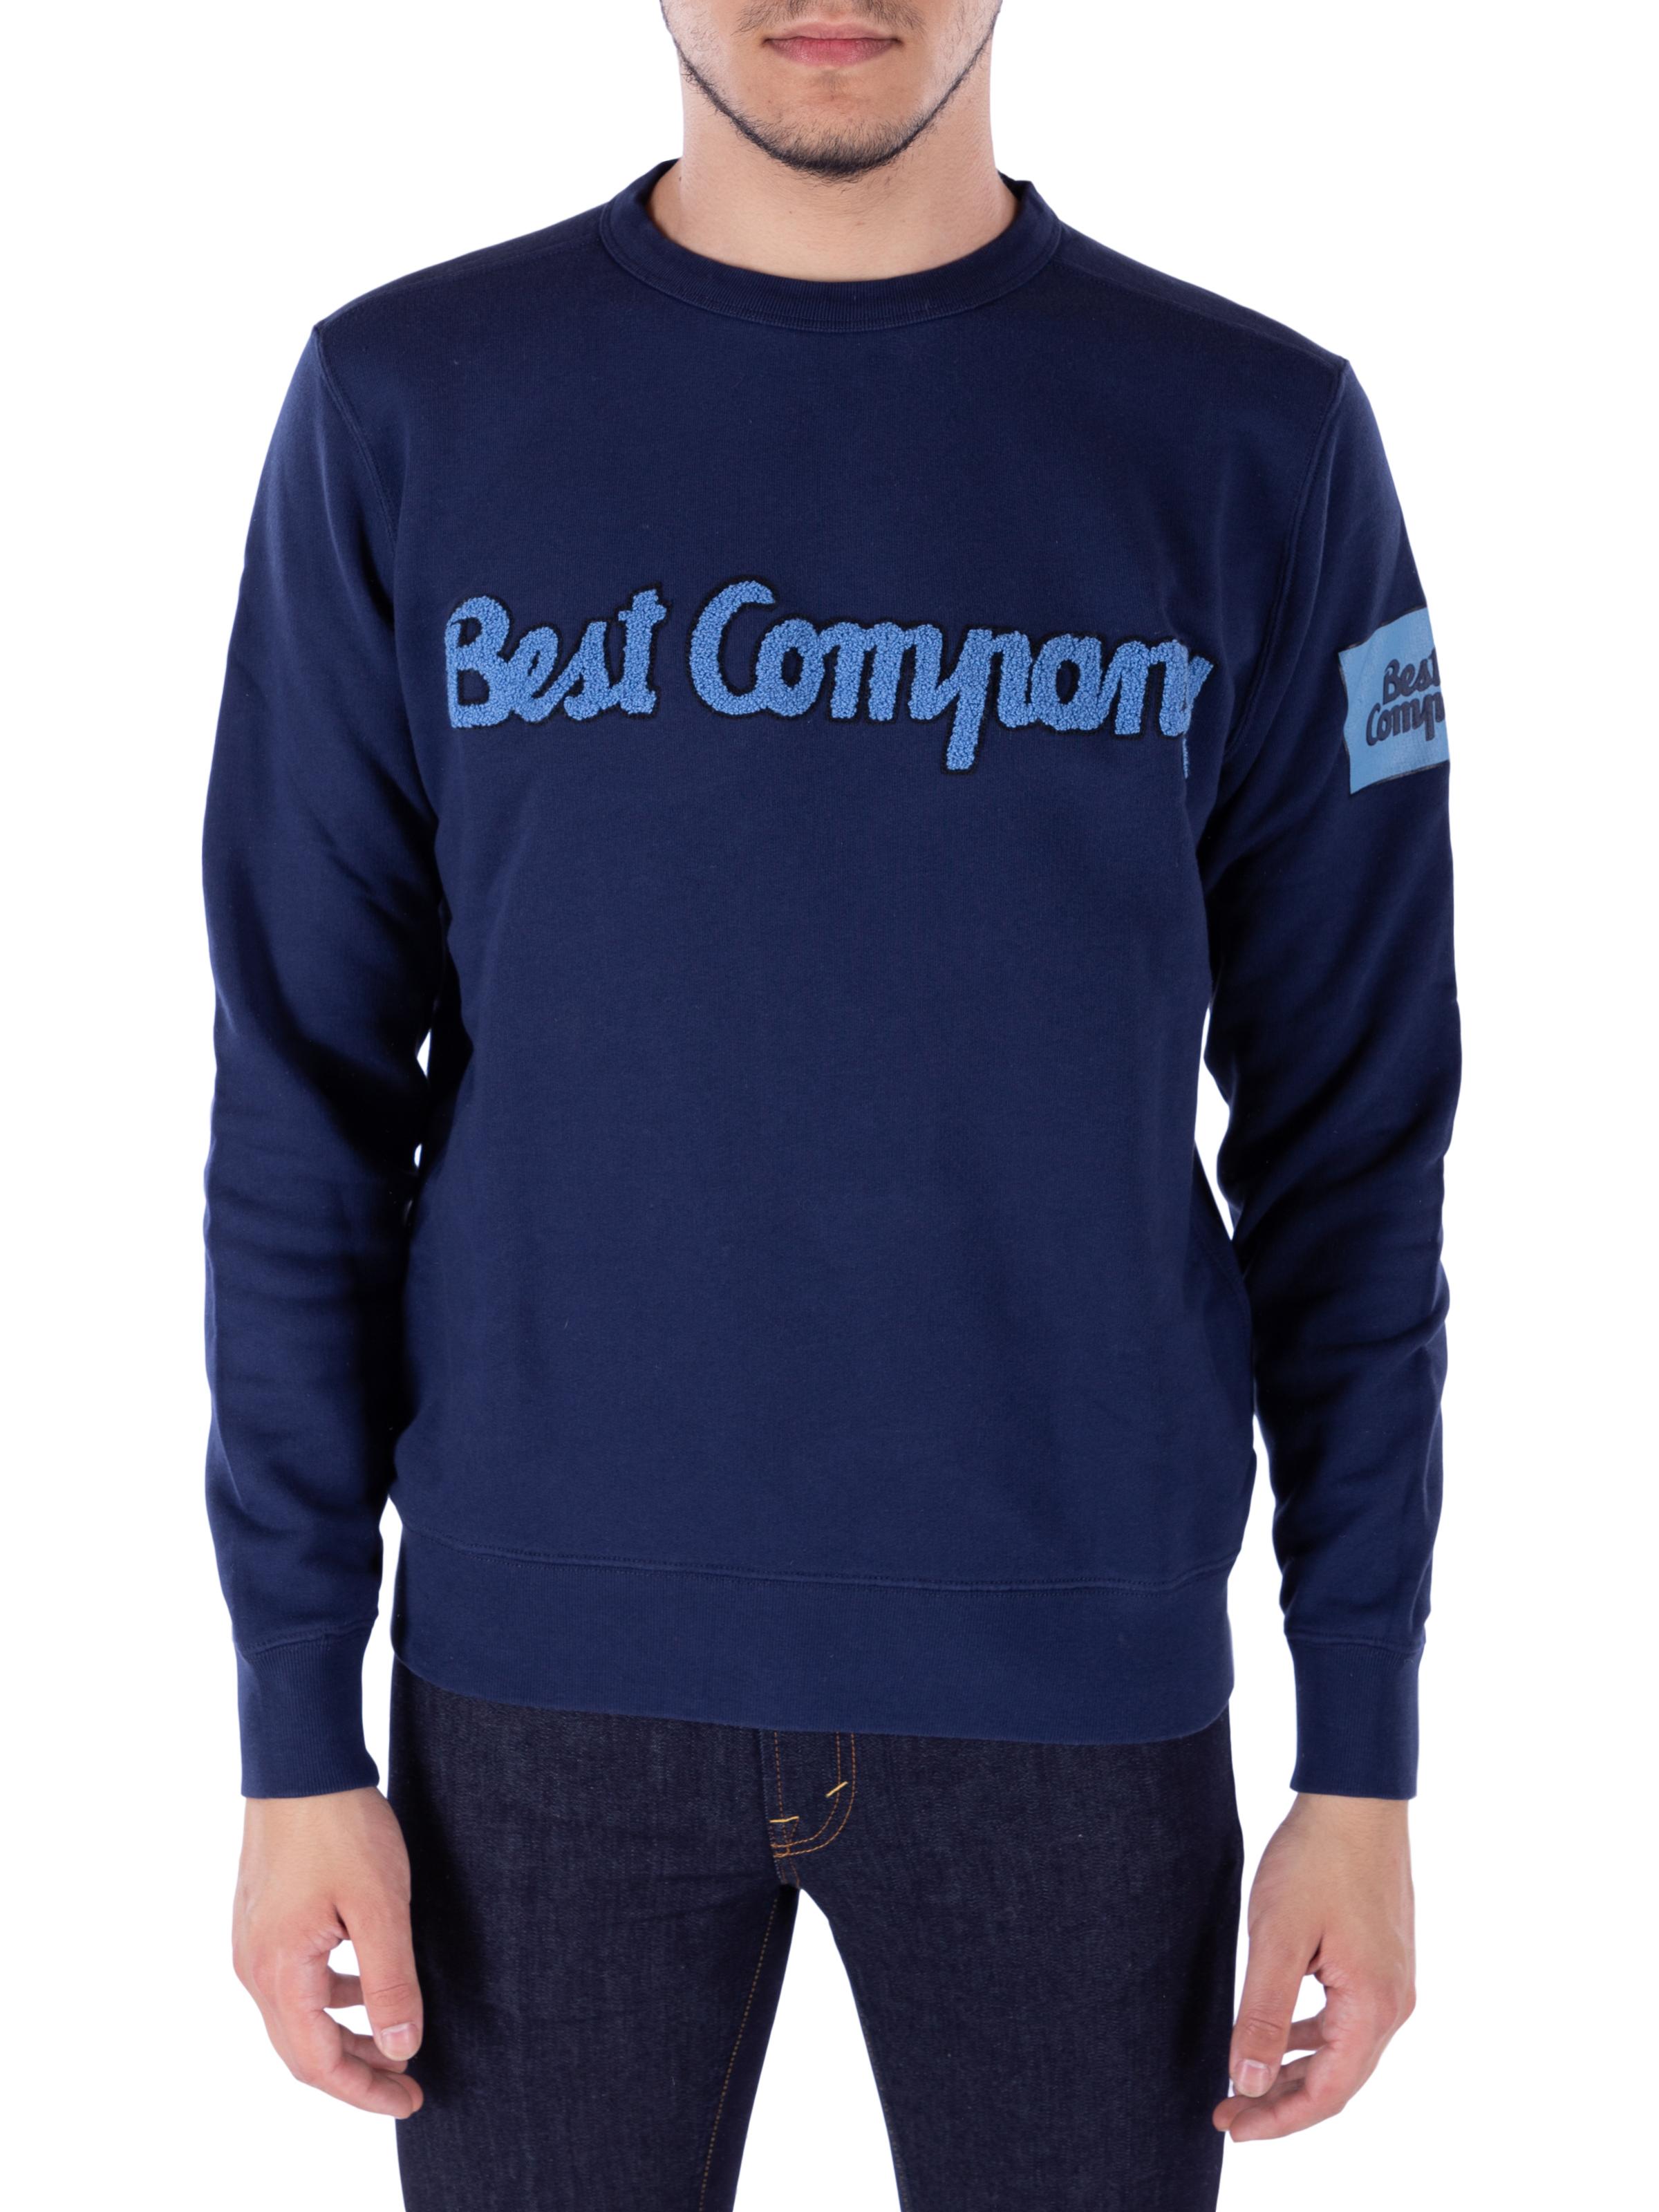 Best Company Felpa 692188 000